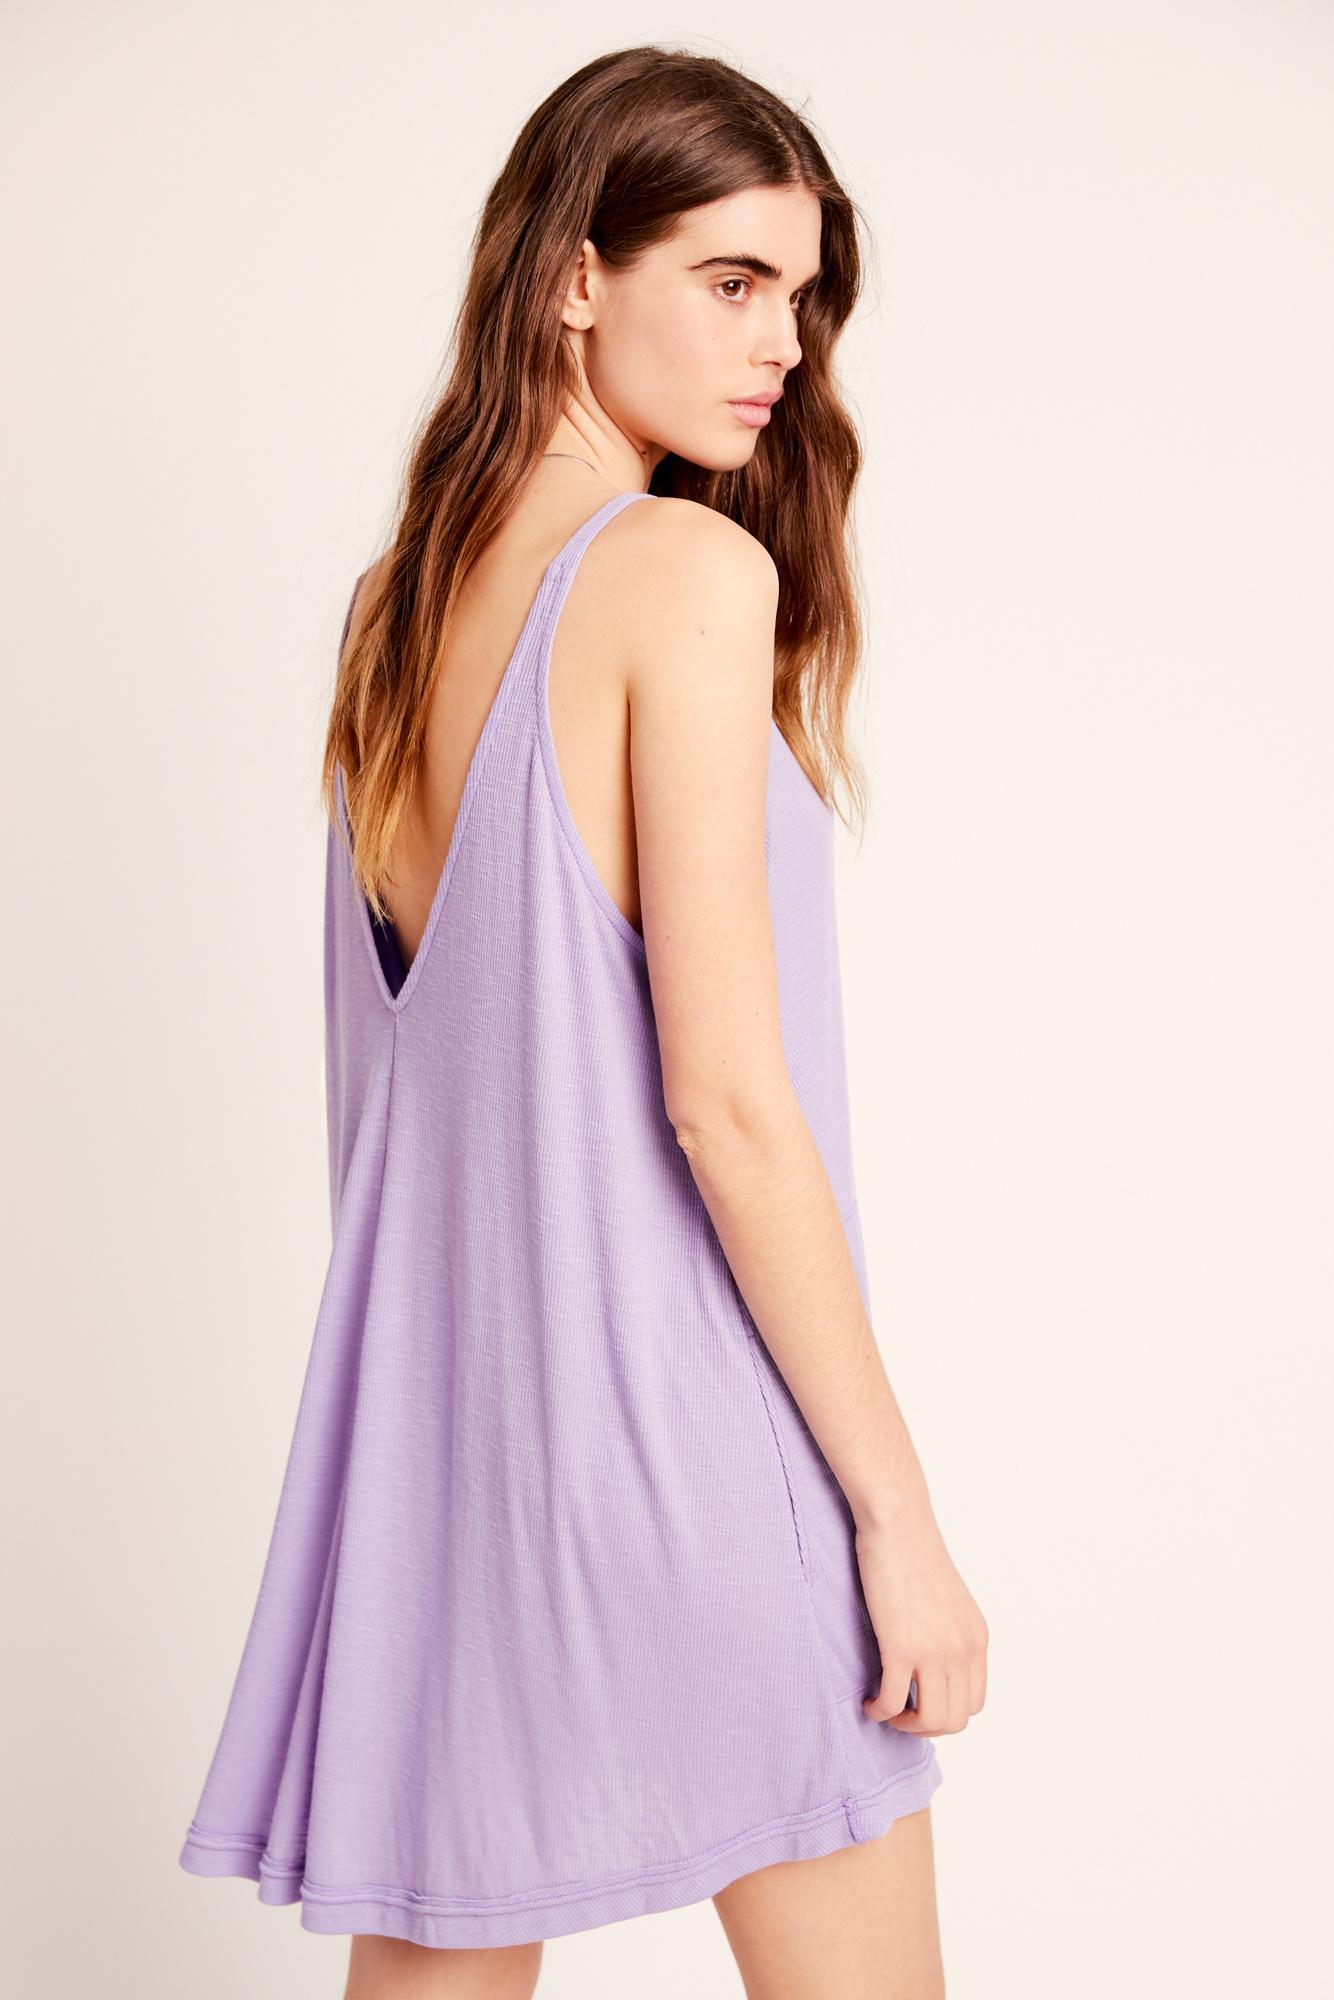 cad2dbd5b7 Lyst - Free People Clovers Mini Dress By Fp Beach in Purple